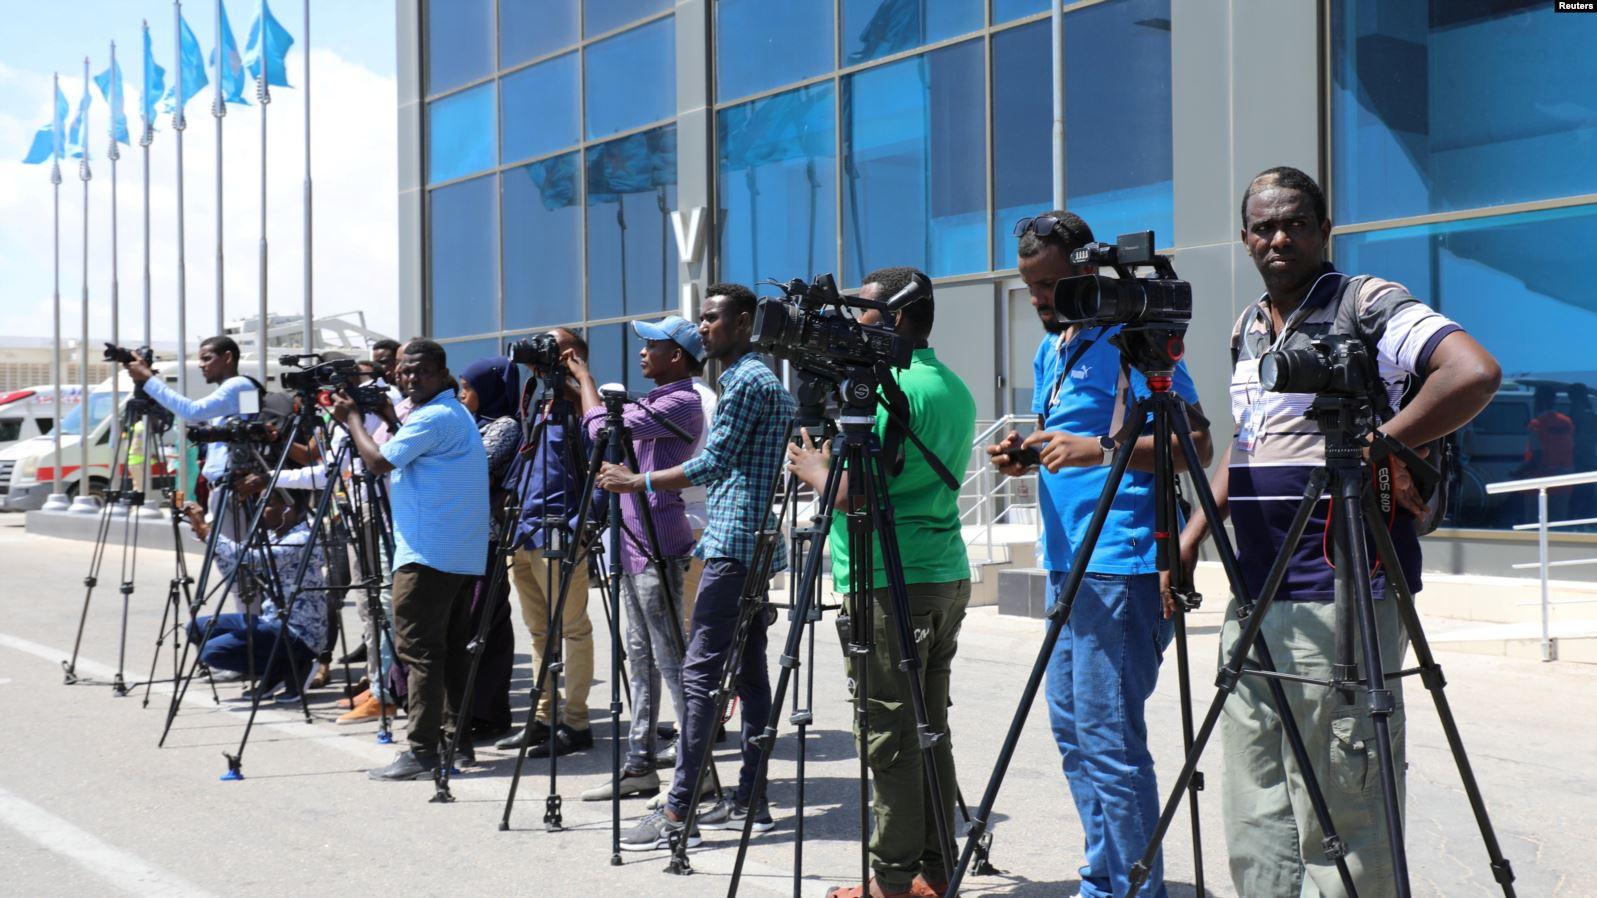 Somali journalists in Mogadishu, Somalia, December 29, 2019.